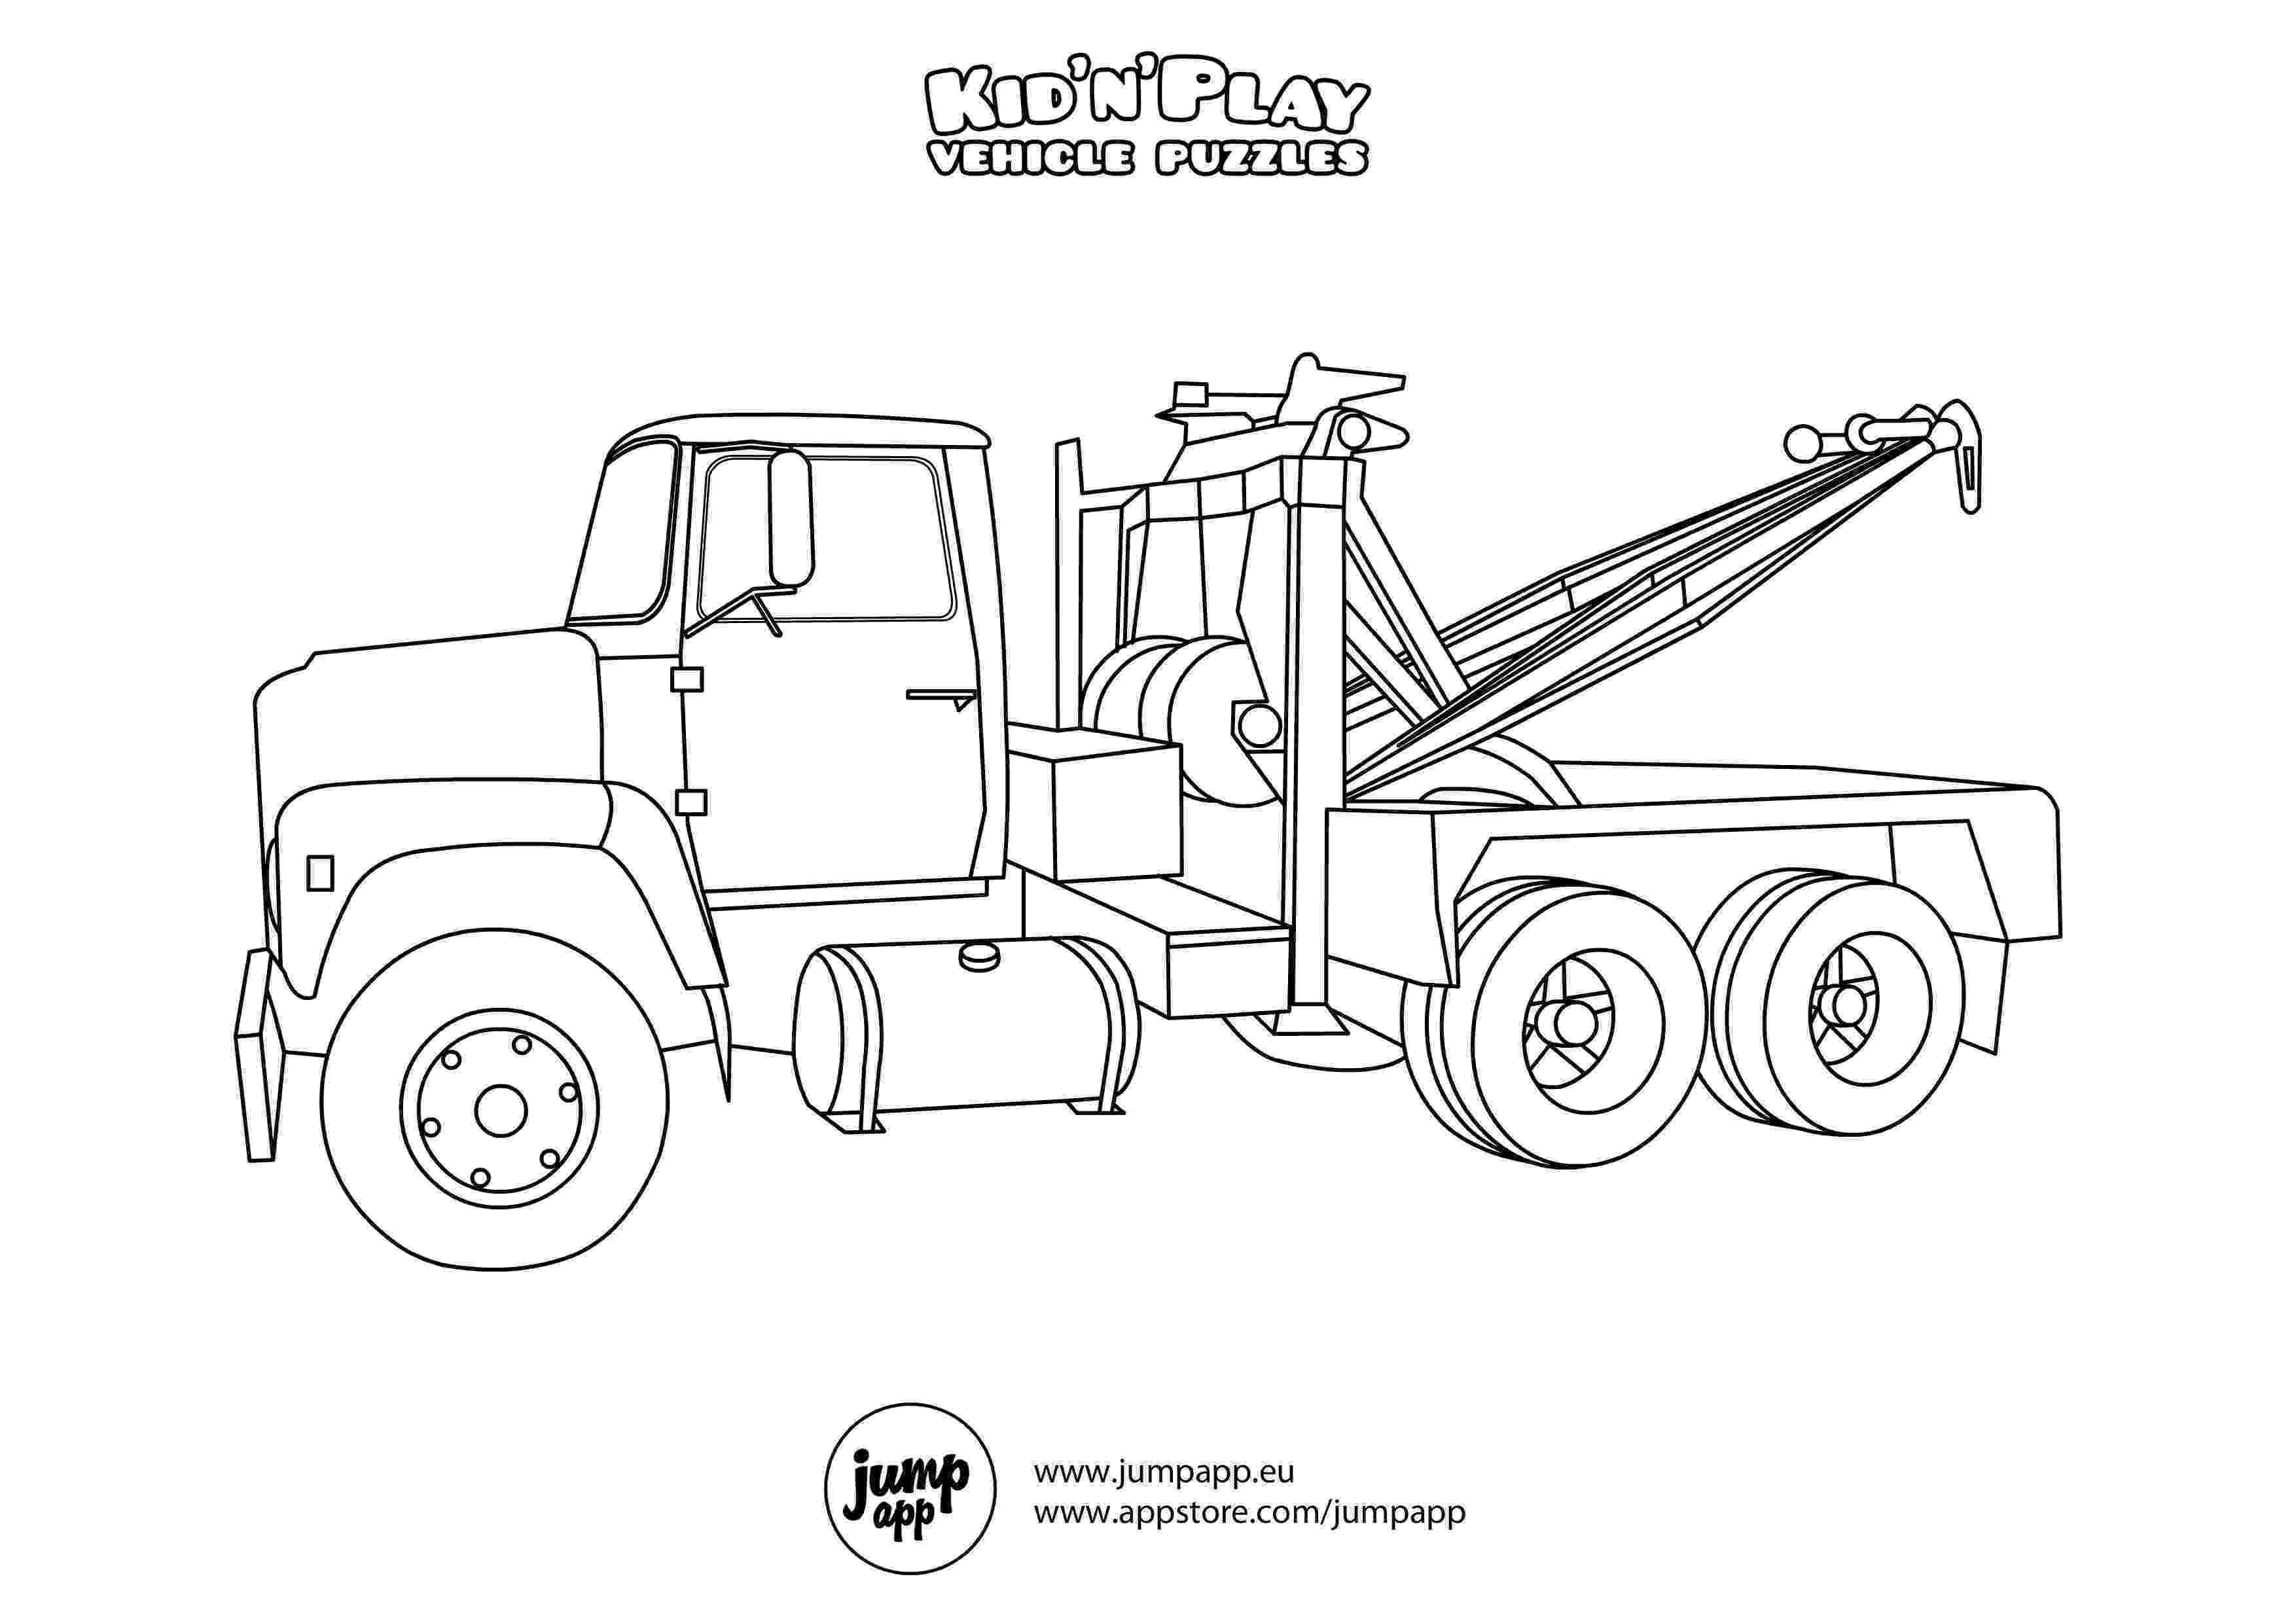 coloring pages of semi trucks semi truck coloring pages to print free coloring books of semi pages trucks coloring